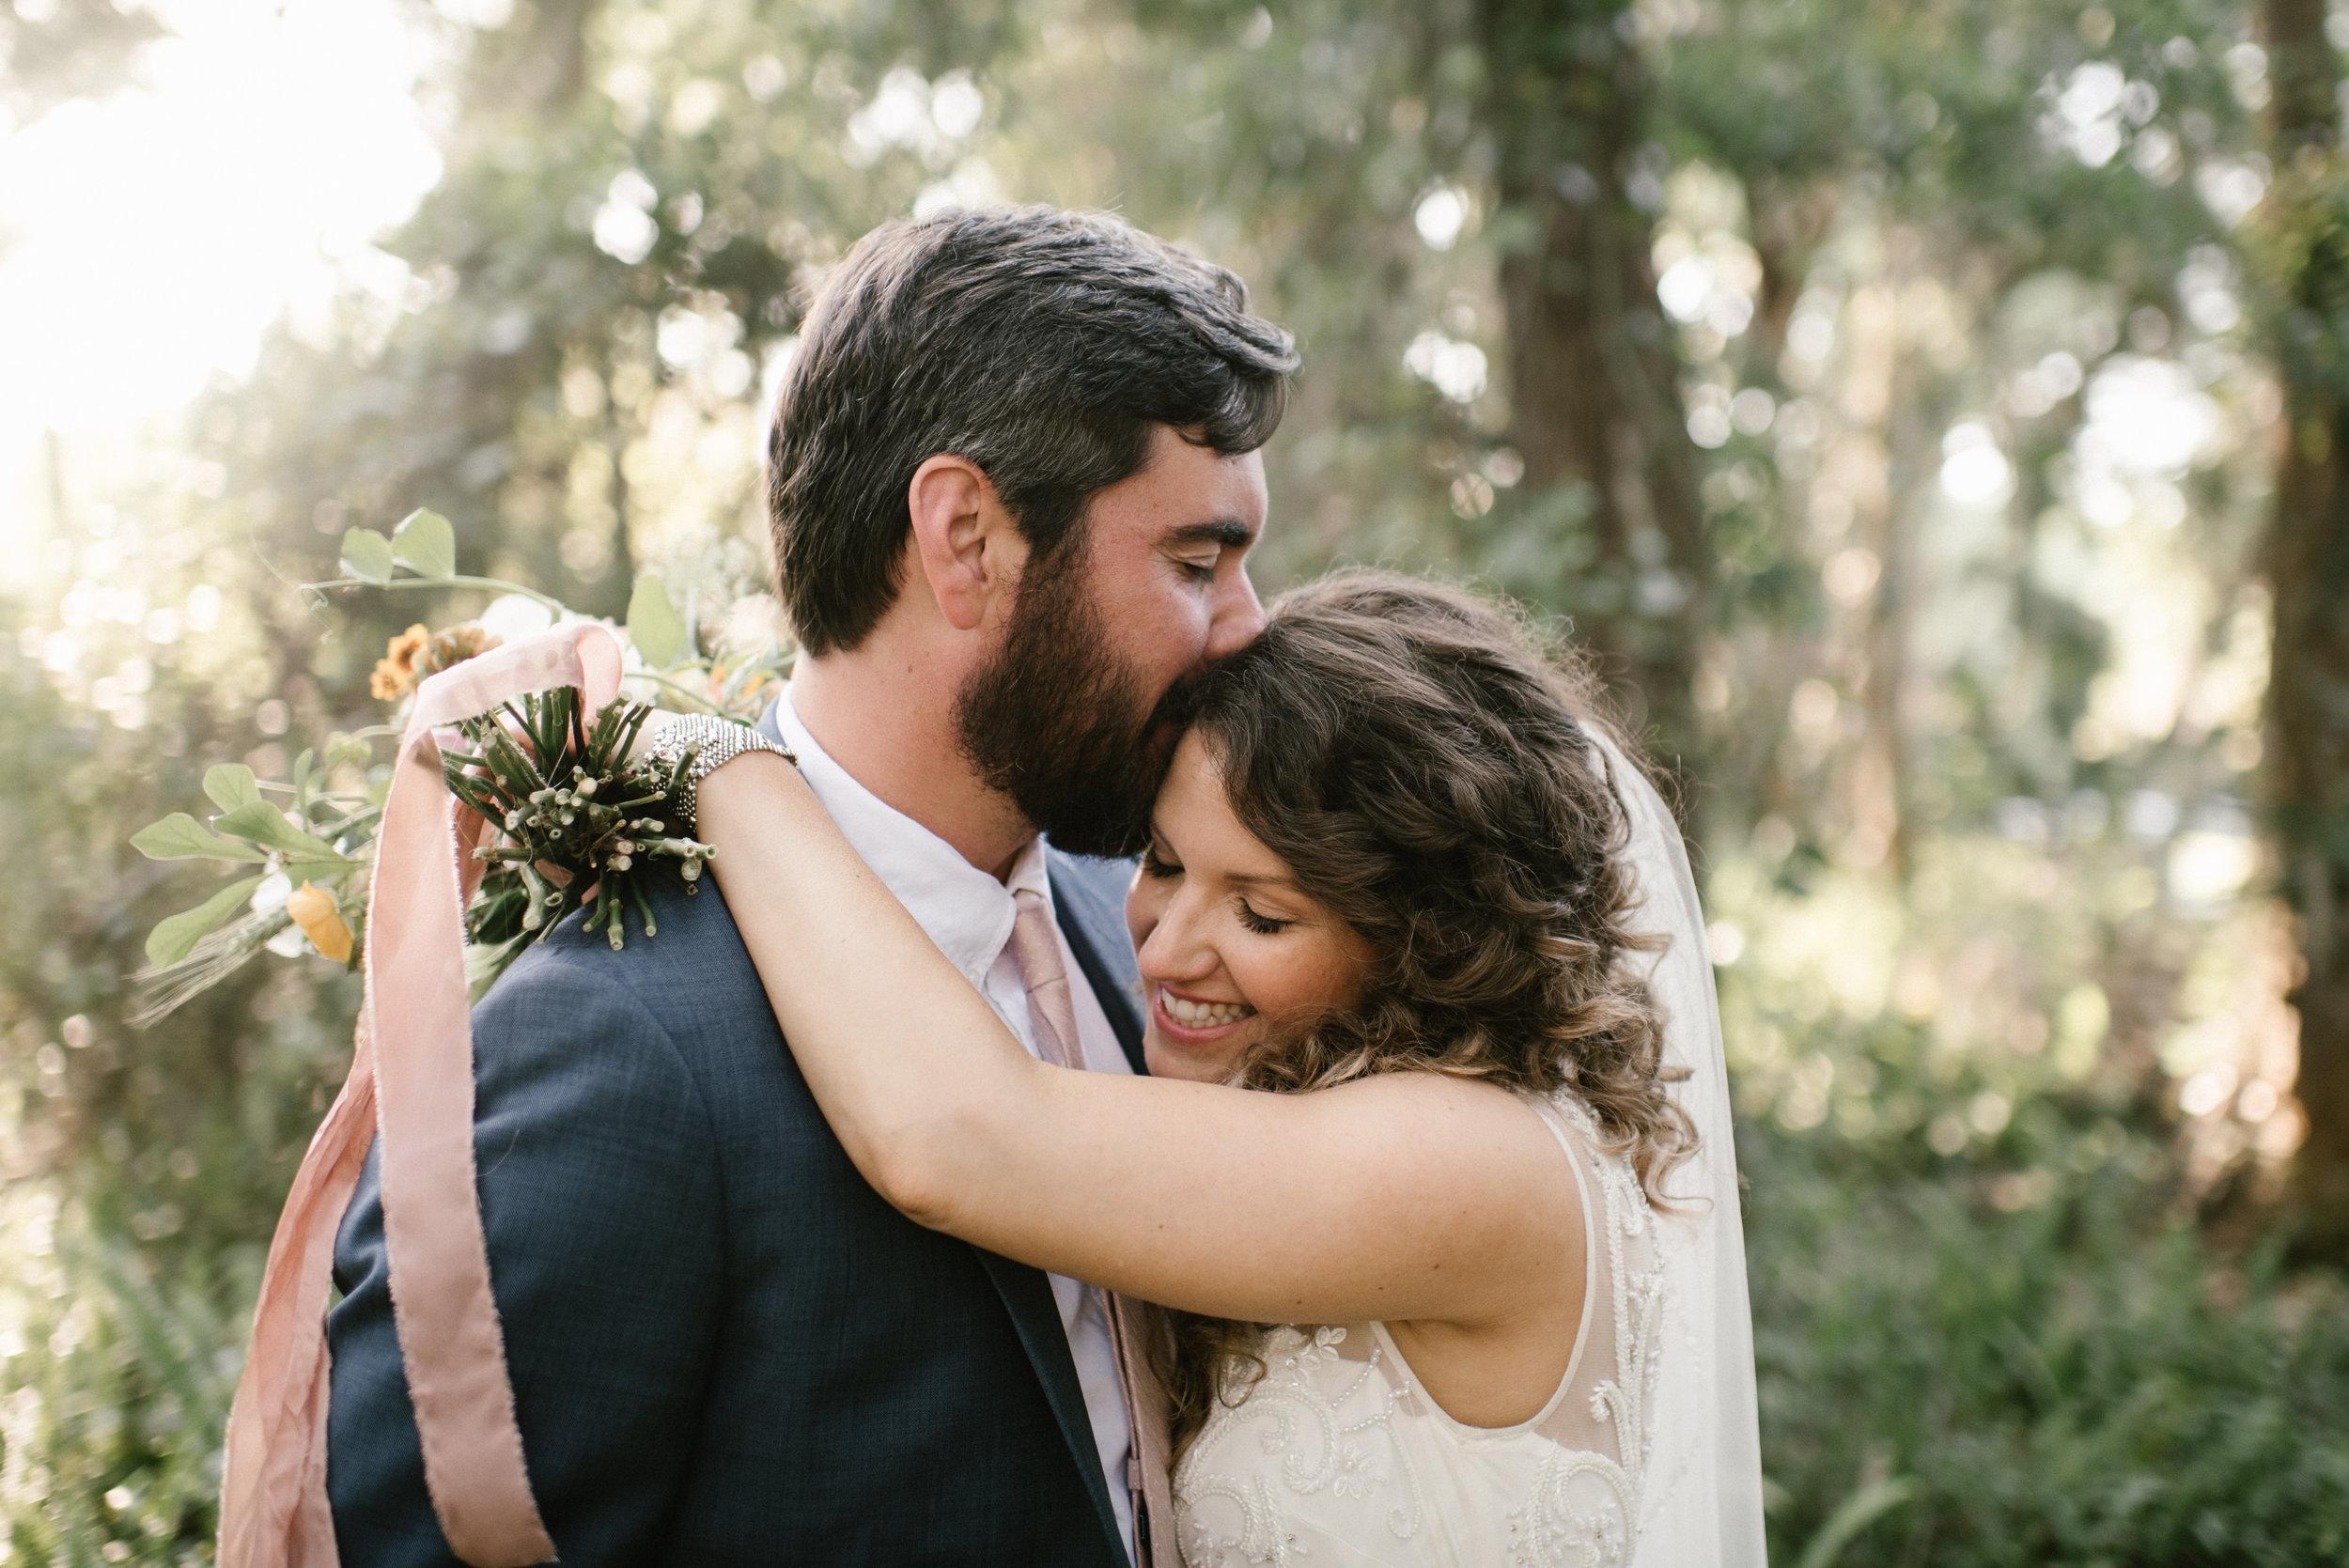 mclaughlin-wedding-777.jpg